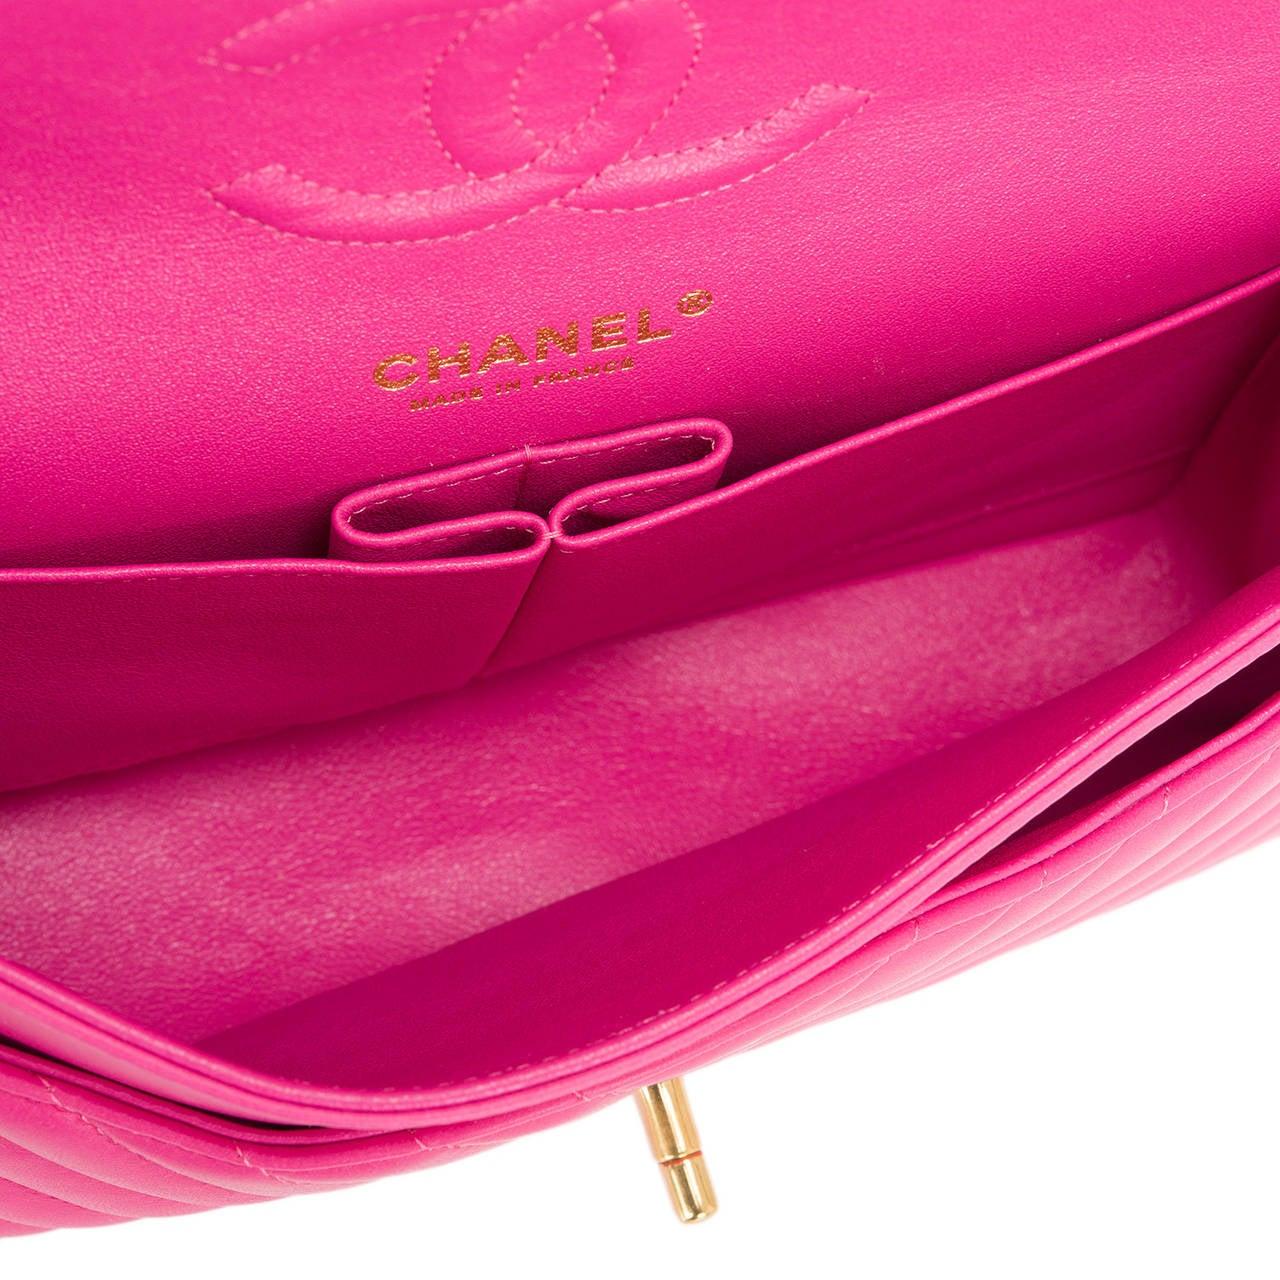 Chanel Fuchsia Chevron Medium Classic Double Flap Bag For Sale 1